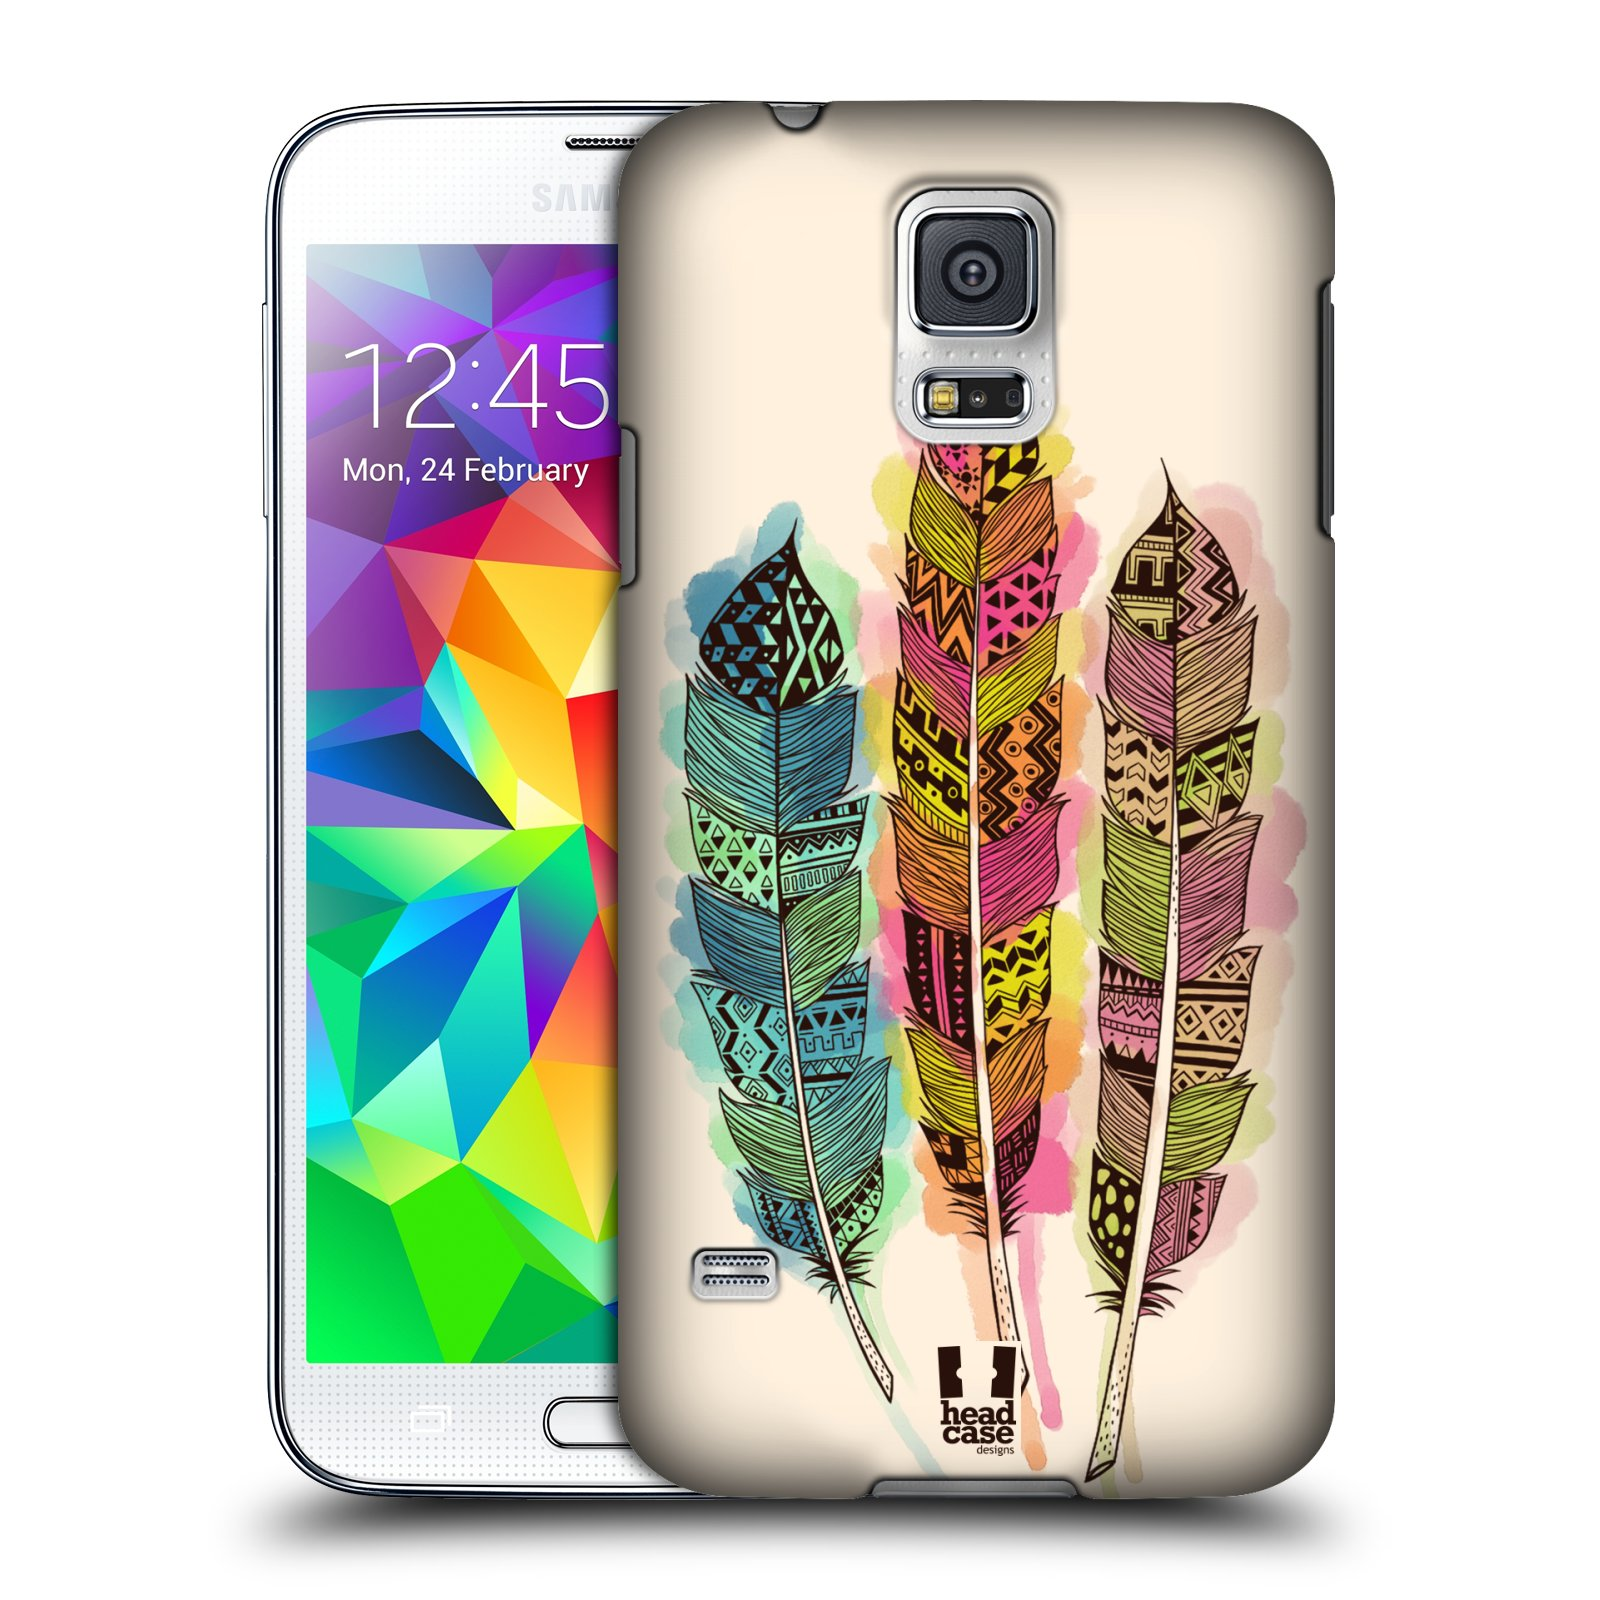 Plastové pouzdro na mobil Samsung Galaxy S5 HEAD CASE AZTEC PÍRKA SPLASH